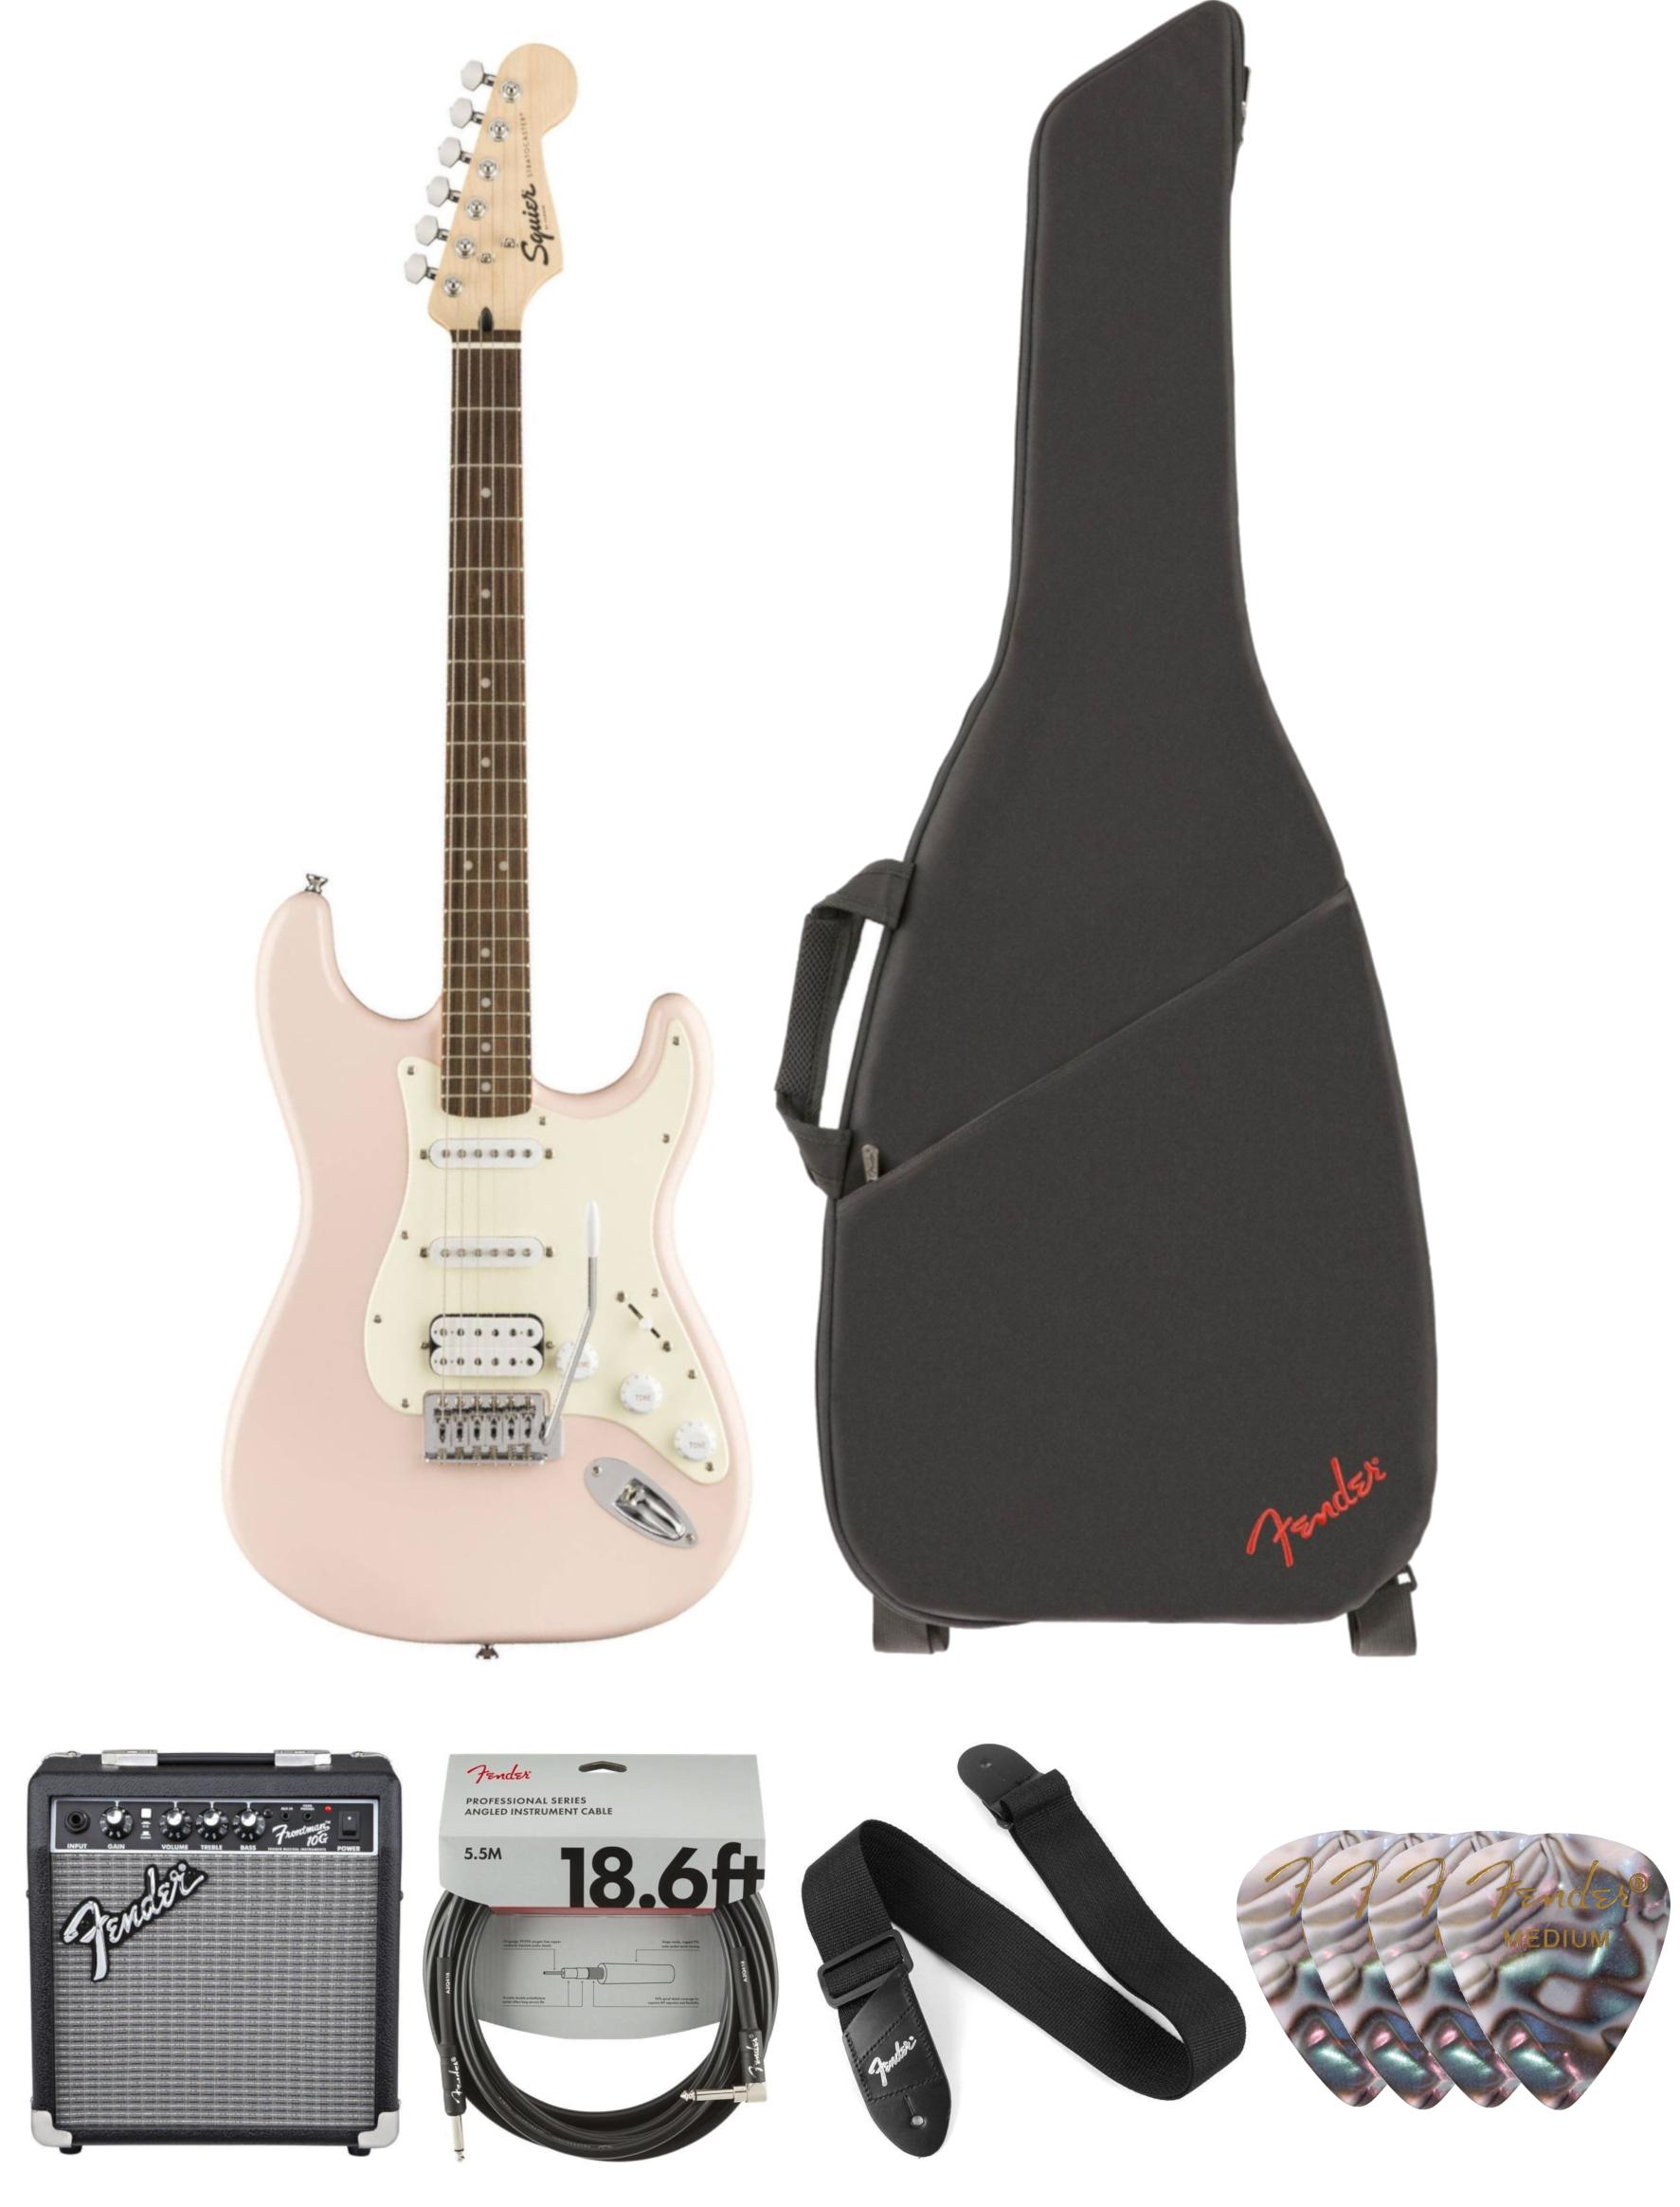 Squier Bullet Stratocaster With Trem Black